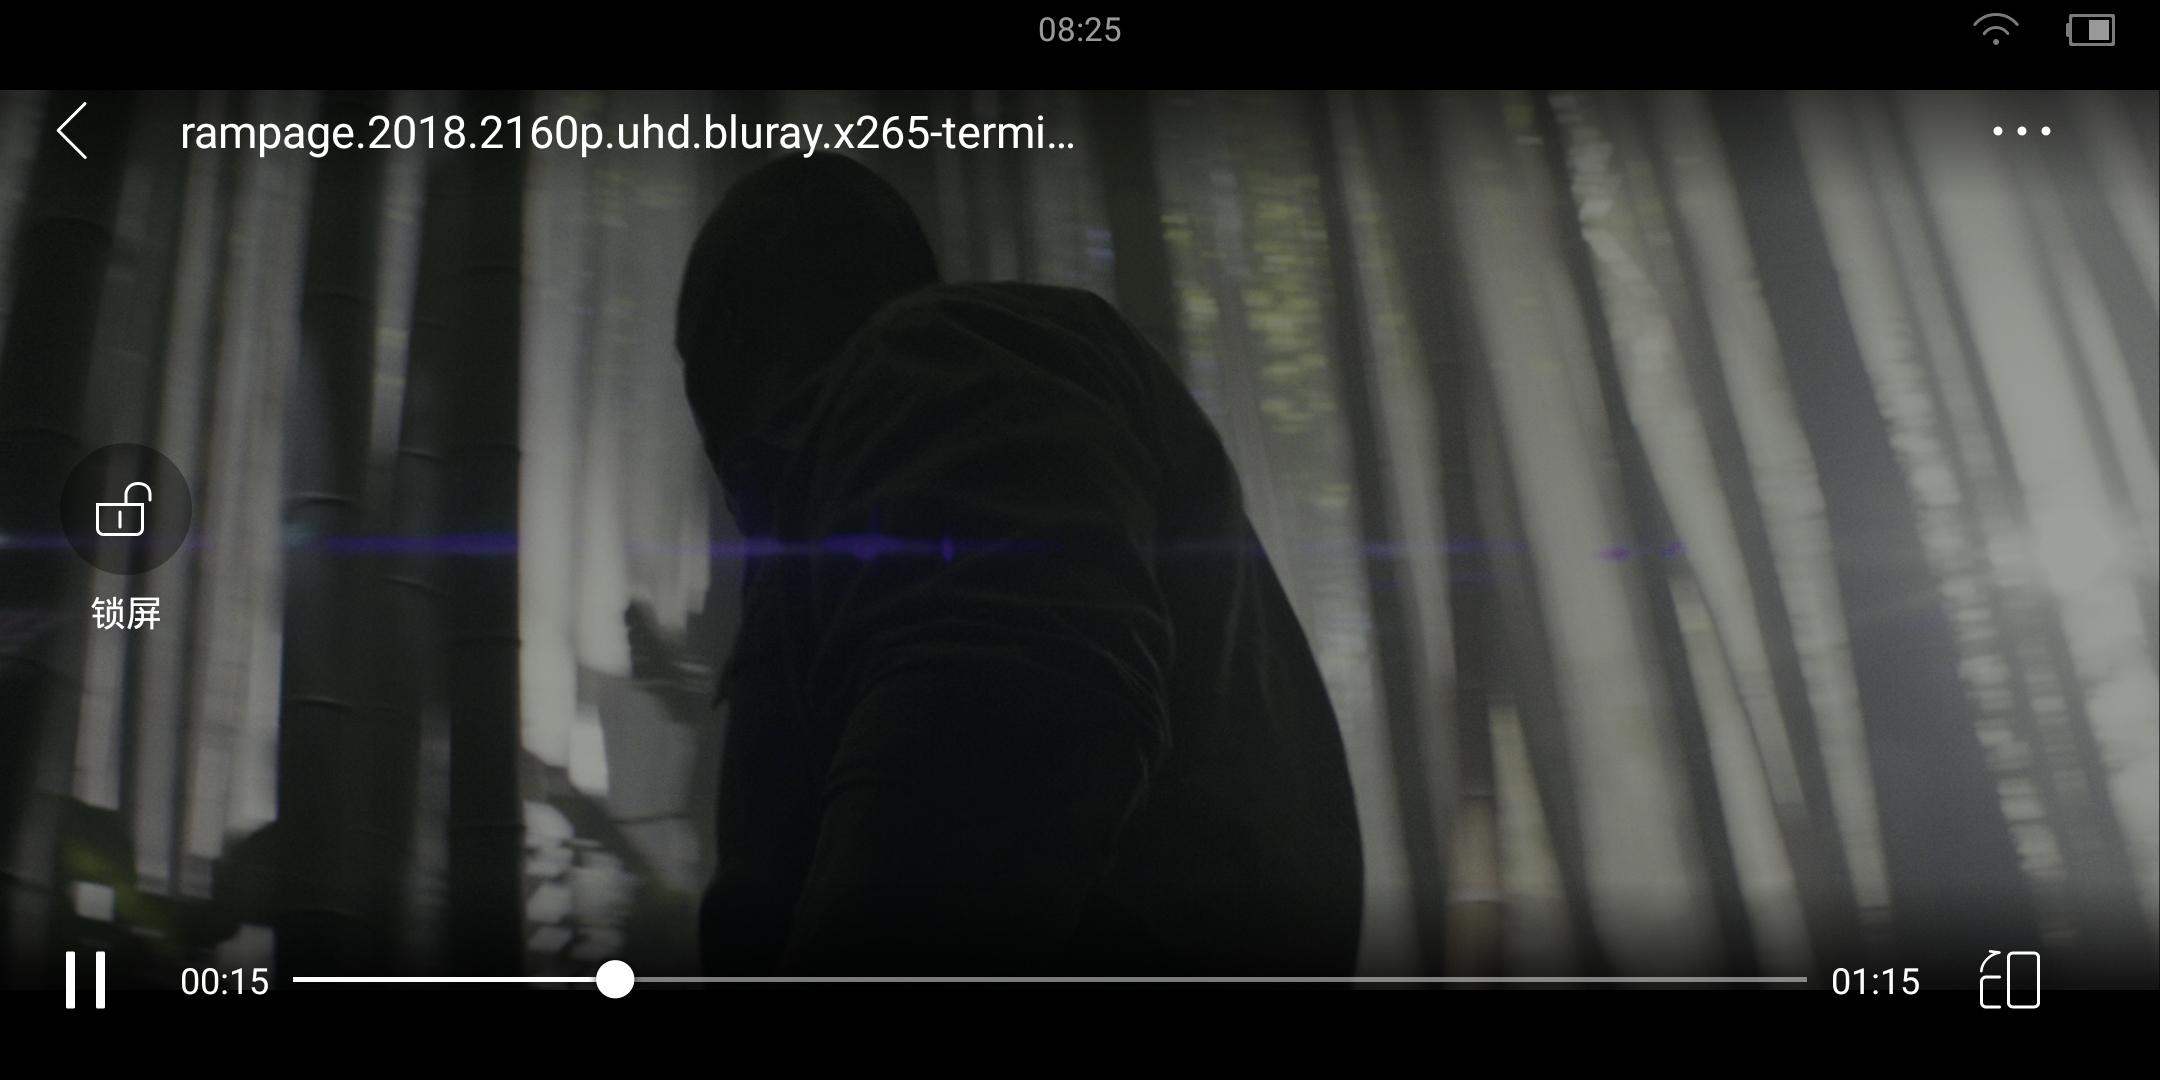 Screenshot_20200706_082520_com.msdown.lbspms.jpg